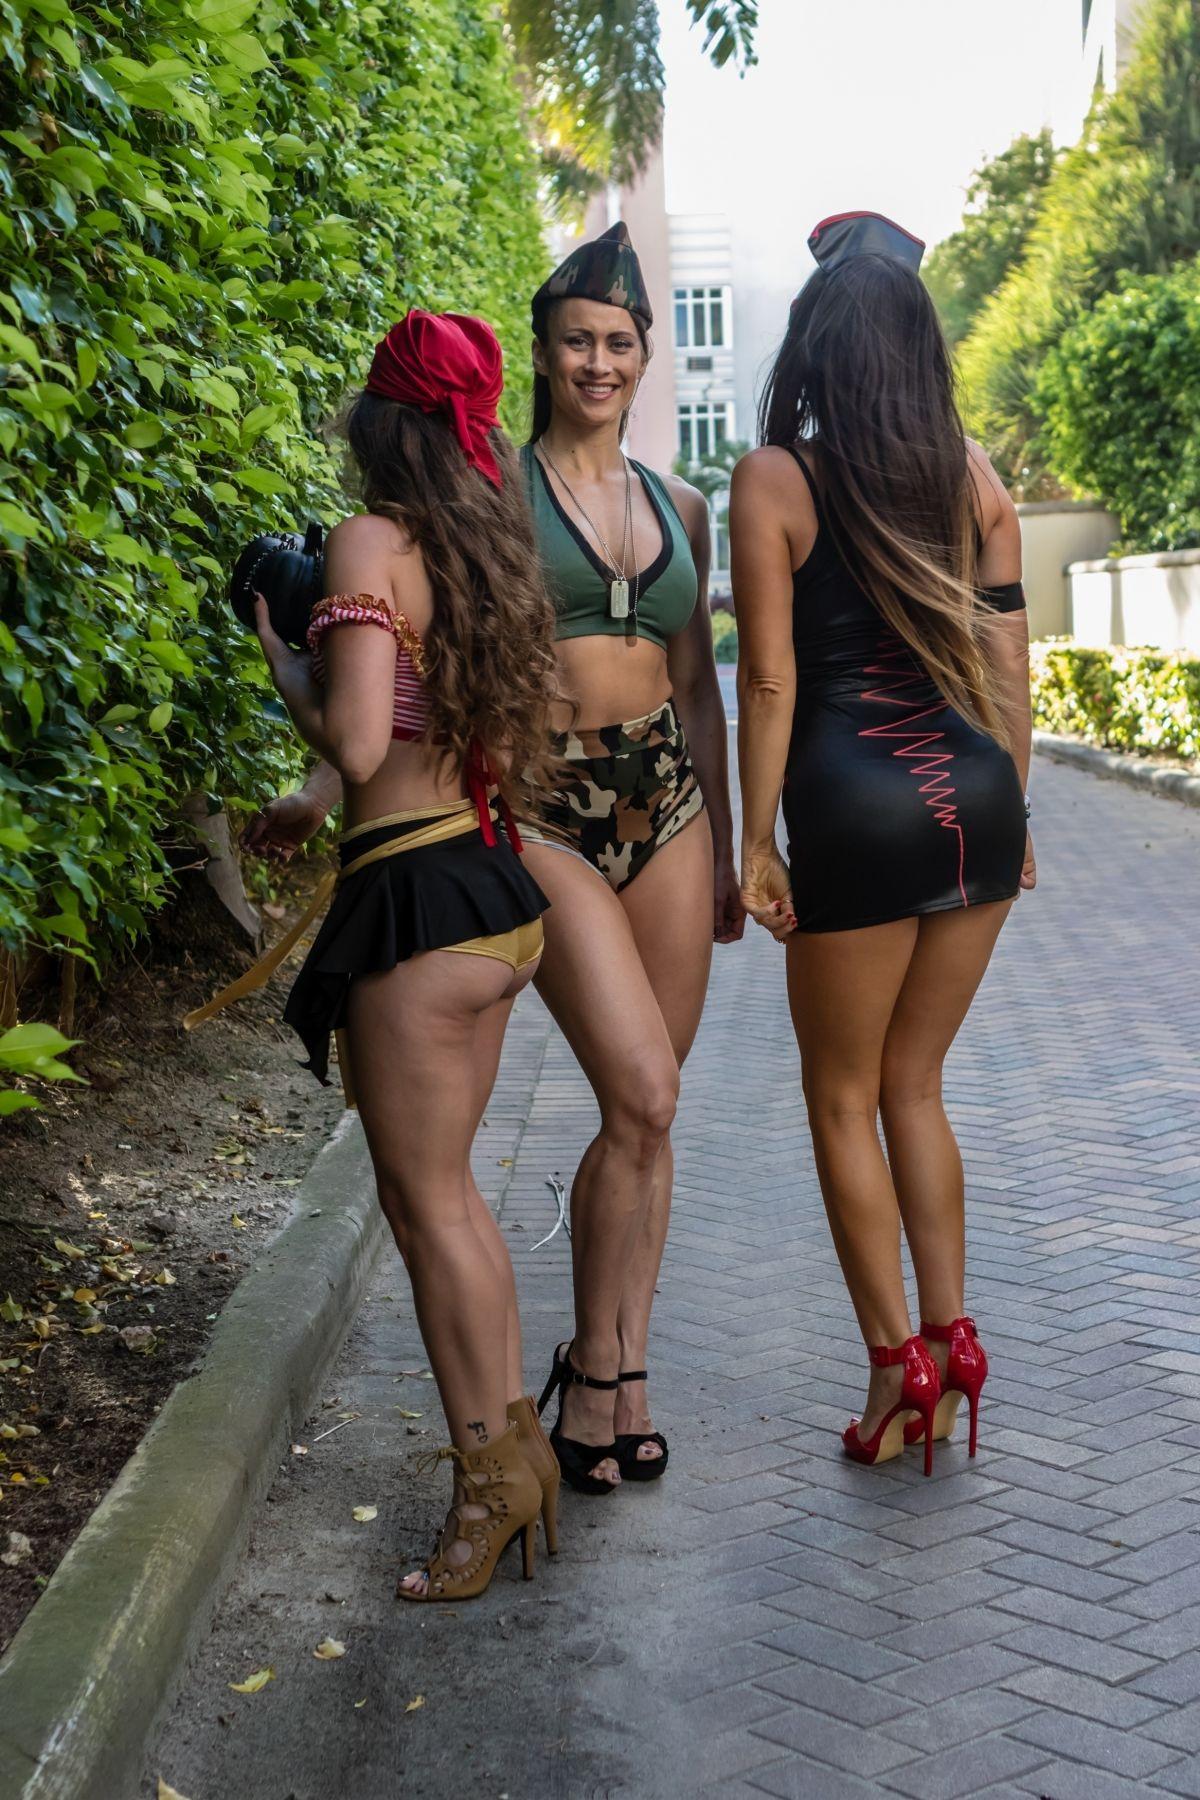 Video Claudia Romani Melissa Lori nude (42 photos), Sexy, Fappening, Instagram, underwear 2006